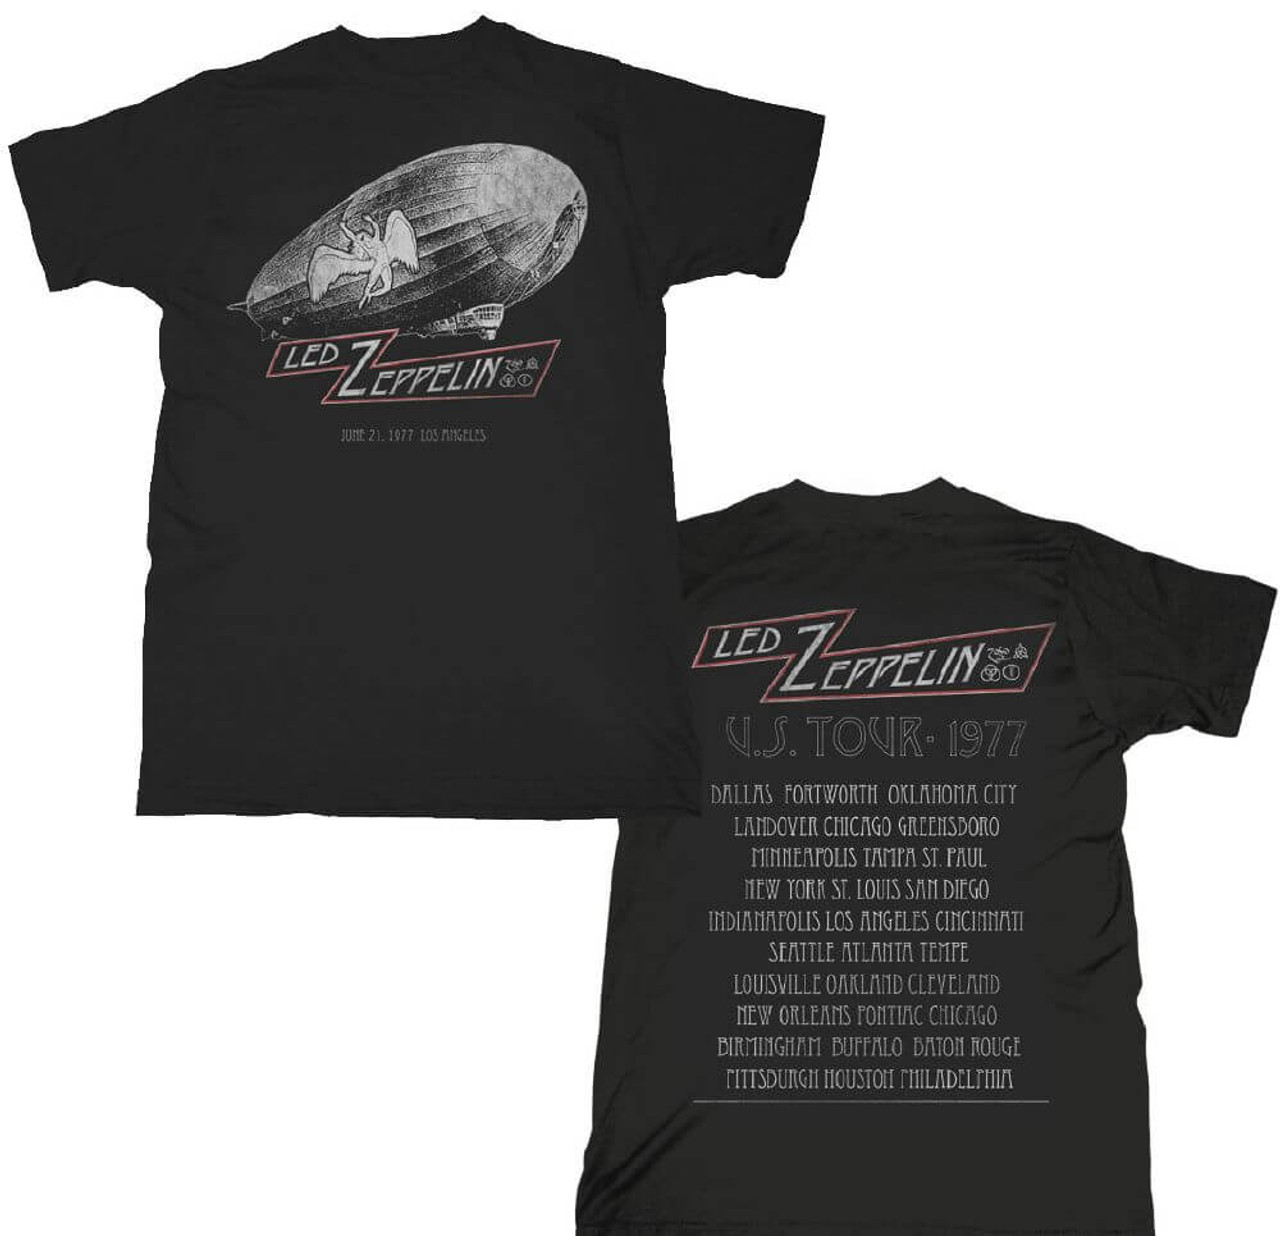 ddacb5ada6c6b Led Zeppelin 1977 United States of America Tour Los Angeles June 21